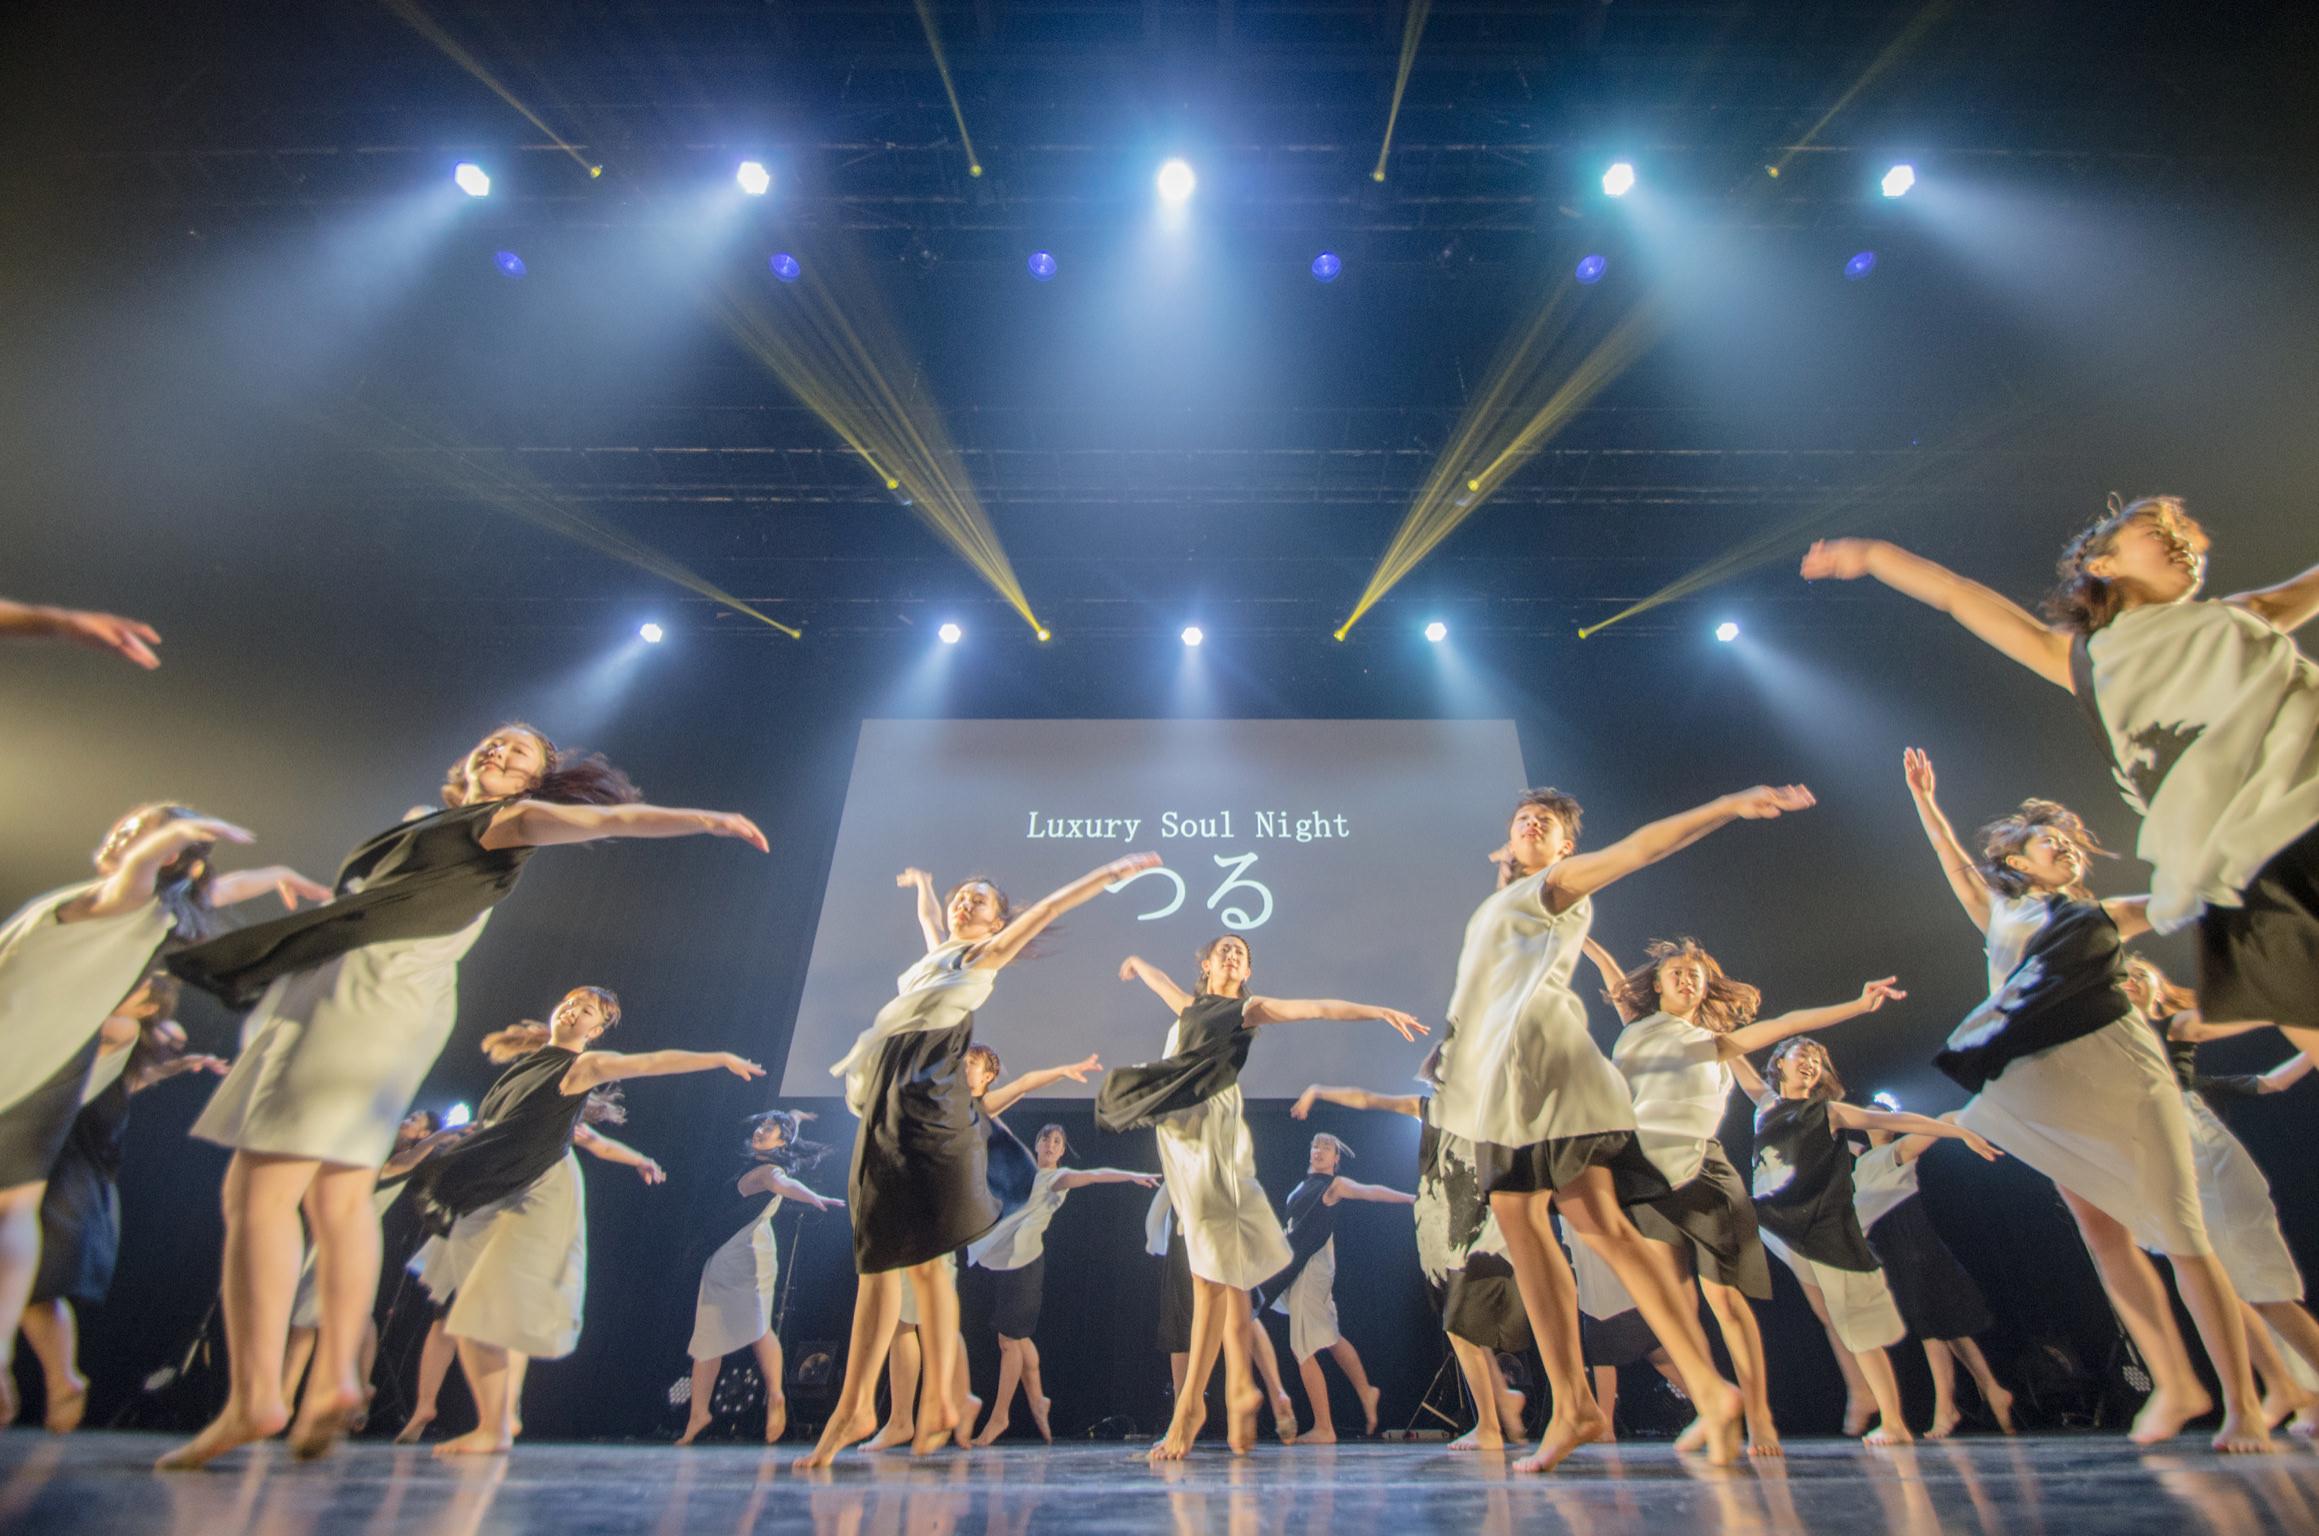 KING OF SWAG, Hilty & Boscheがステージに初登場 – 2018年秋冬&2019年春夏開催の忘れられない1日のステージフォトを公開(全157組) – ダンスの祭典 Luxury Soul Night